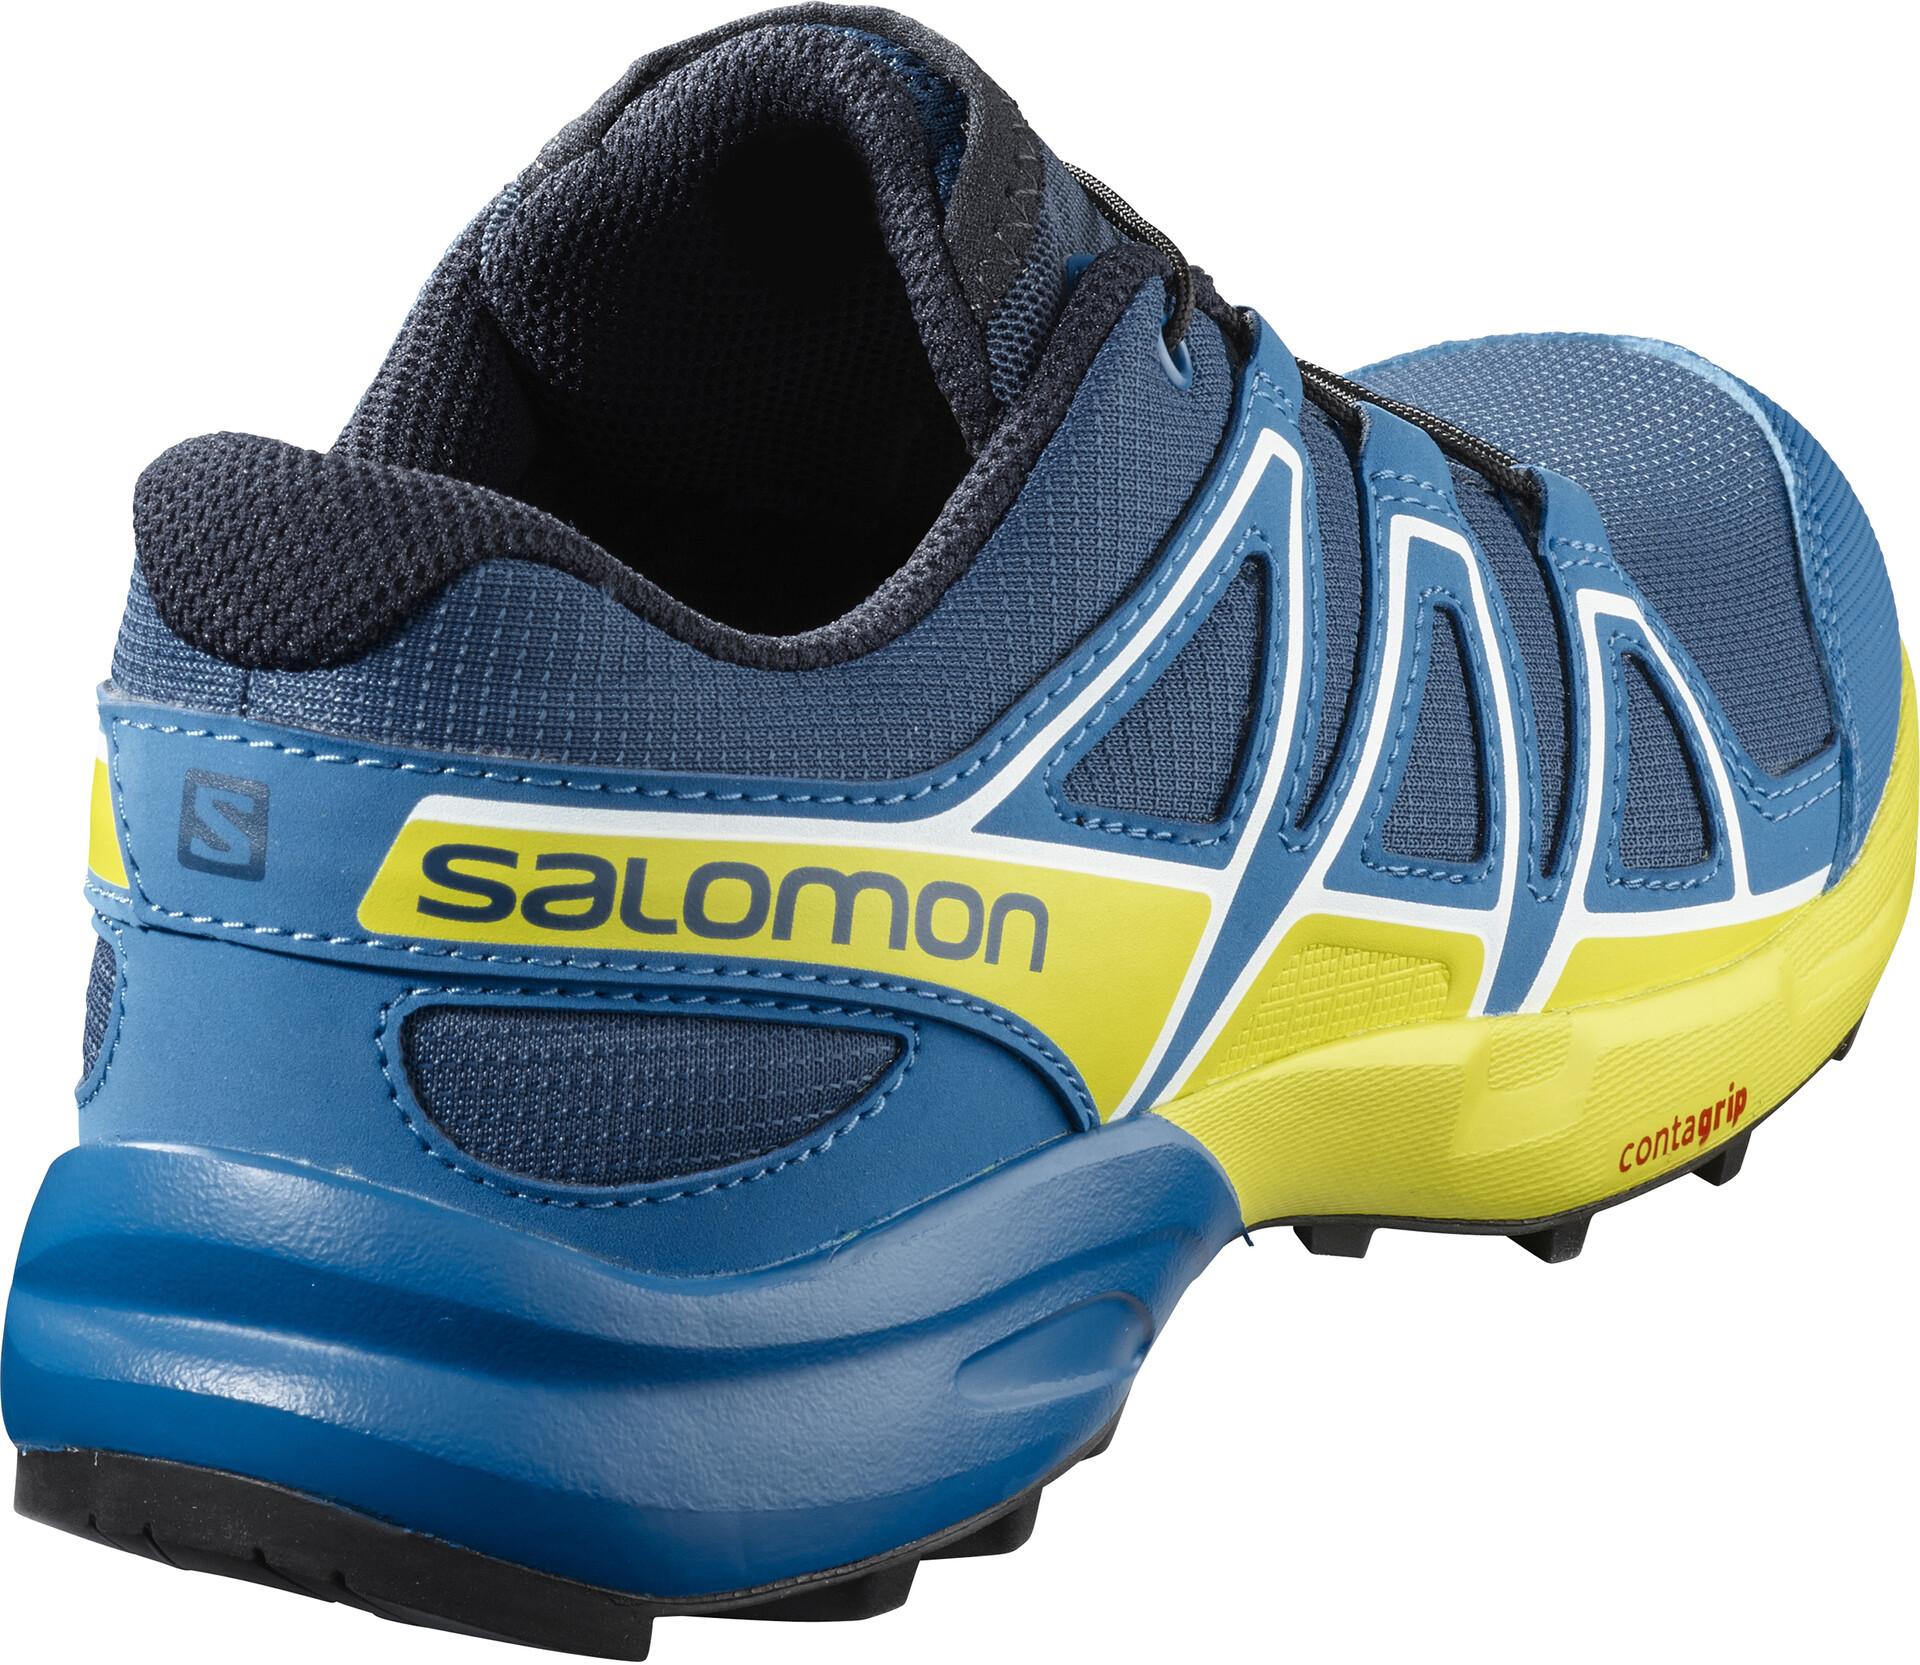 Salomon Speedcross Buty do biegania Dzieci, poseidonsky diversulphur spring